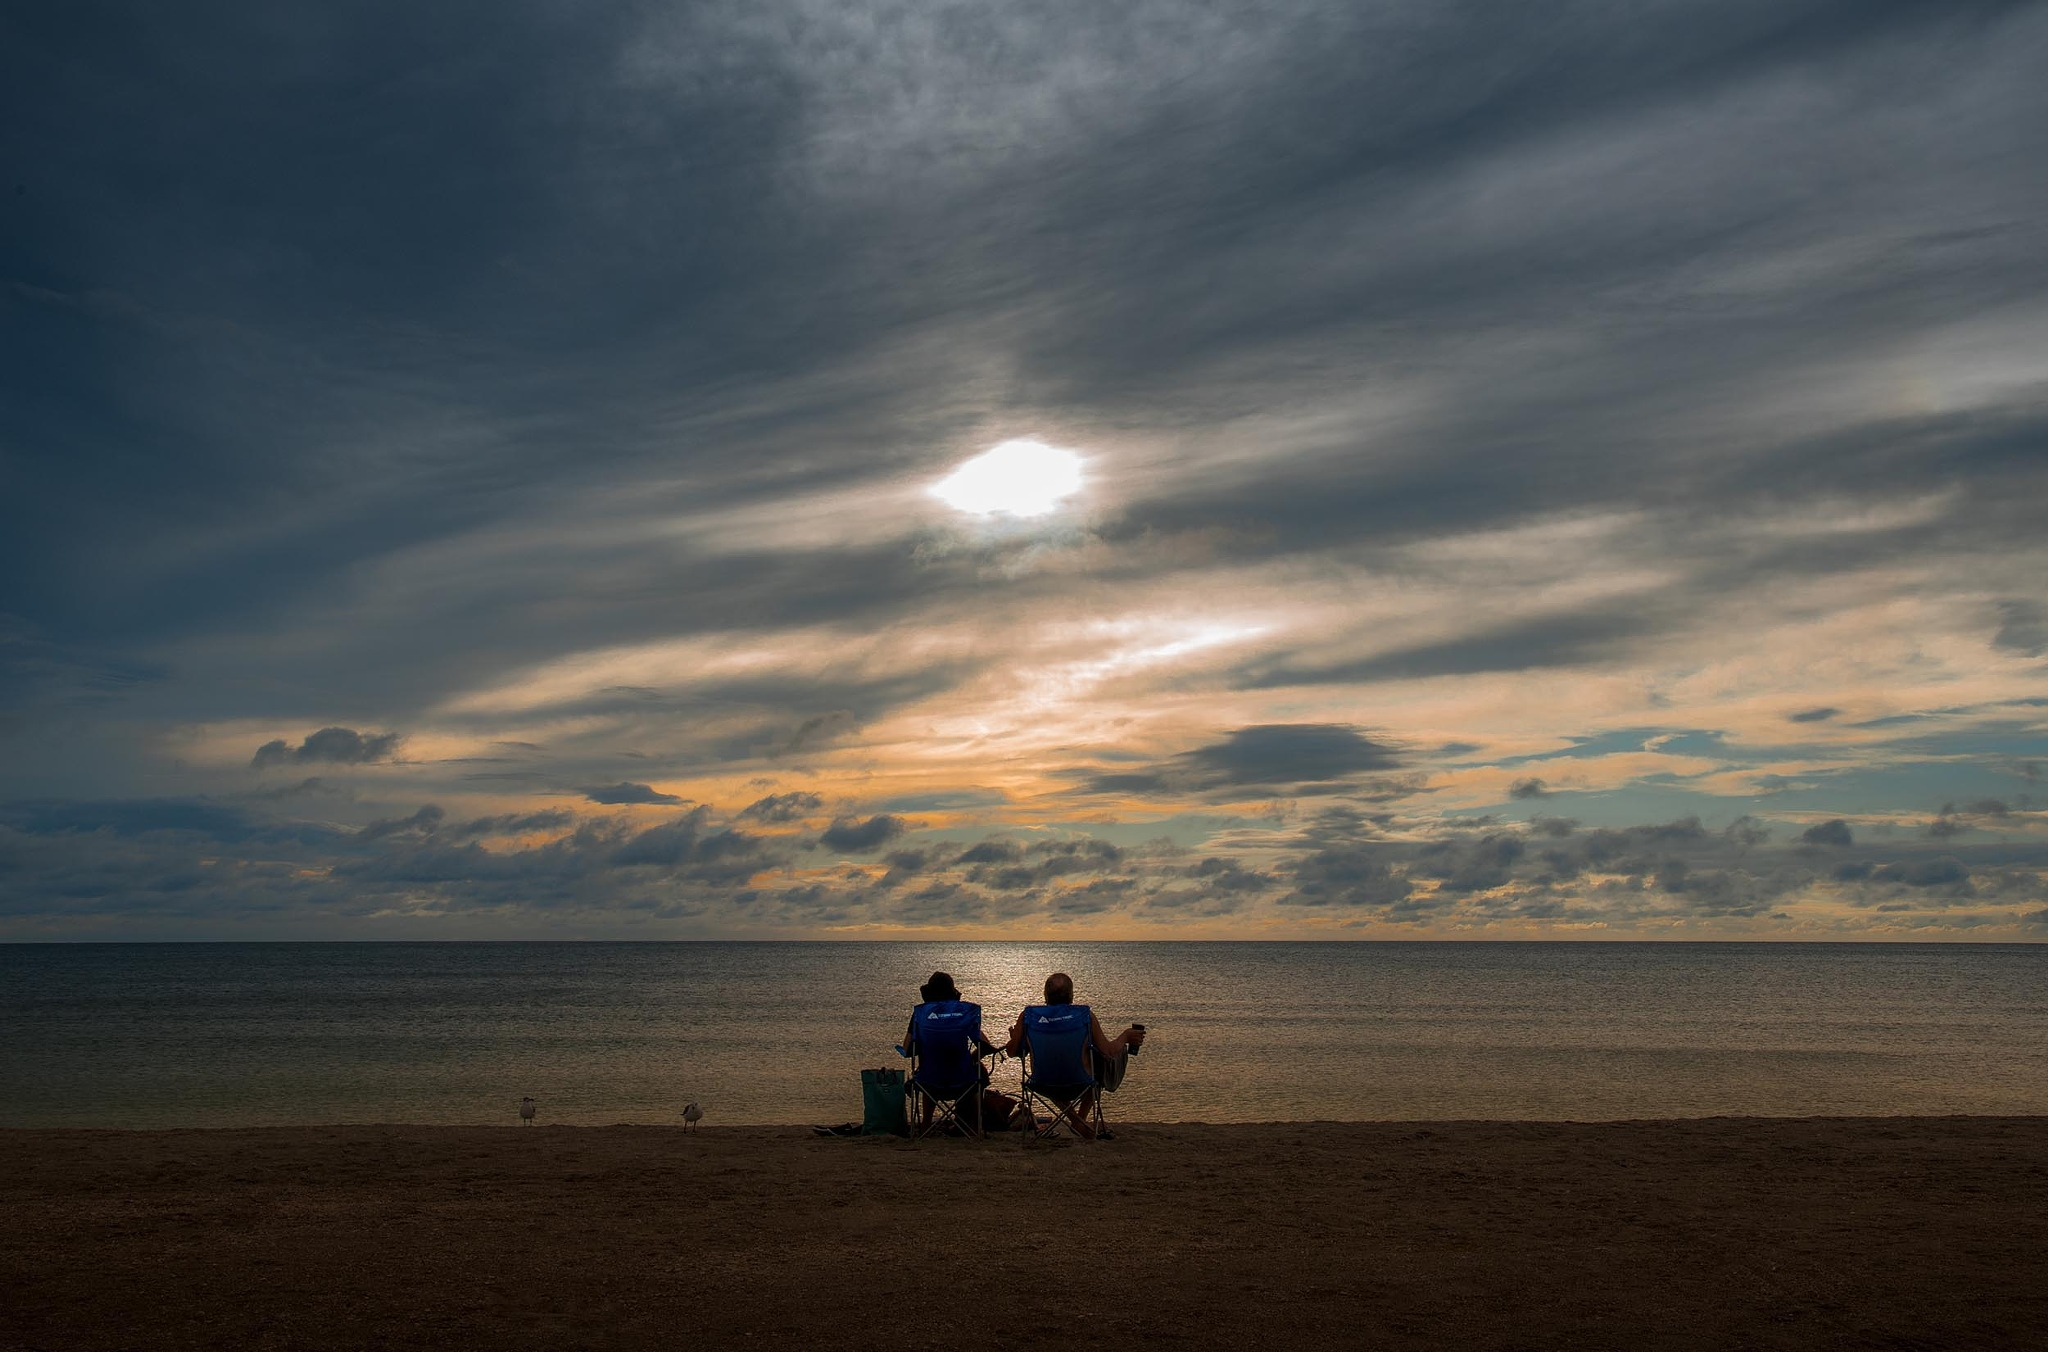 Overcast Sunset for Two (Florida Gulf Coast) © Copyright 2017, Verne Varona by VerneVarona